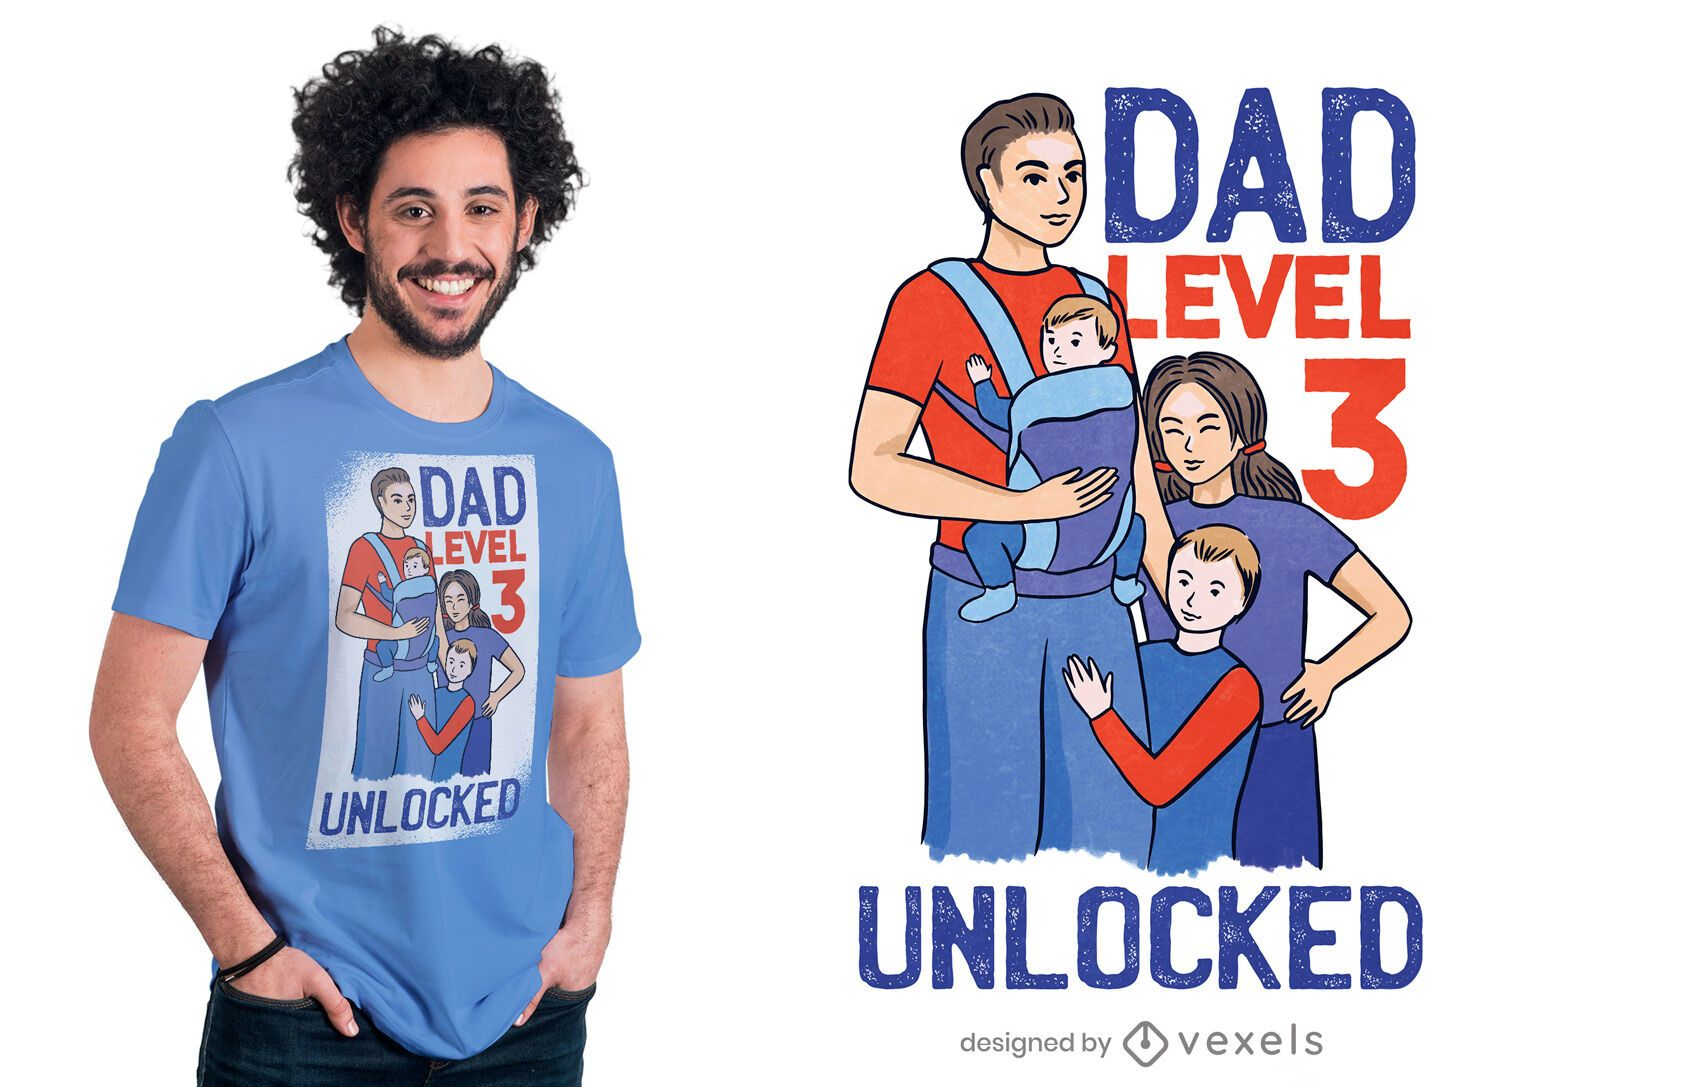 Dad level 3 t-shirt design